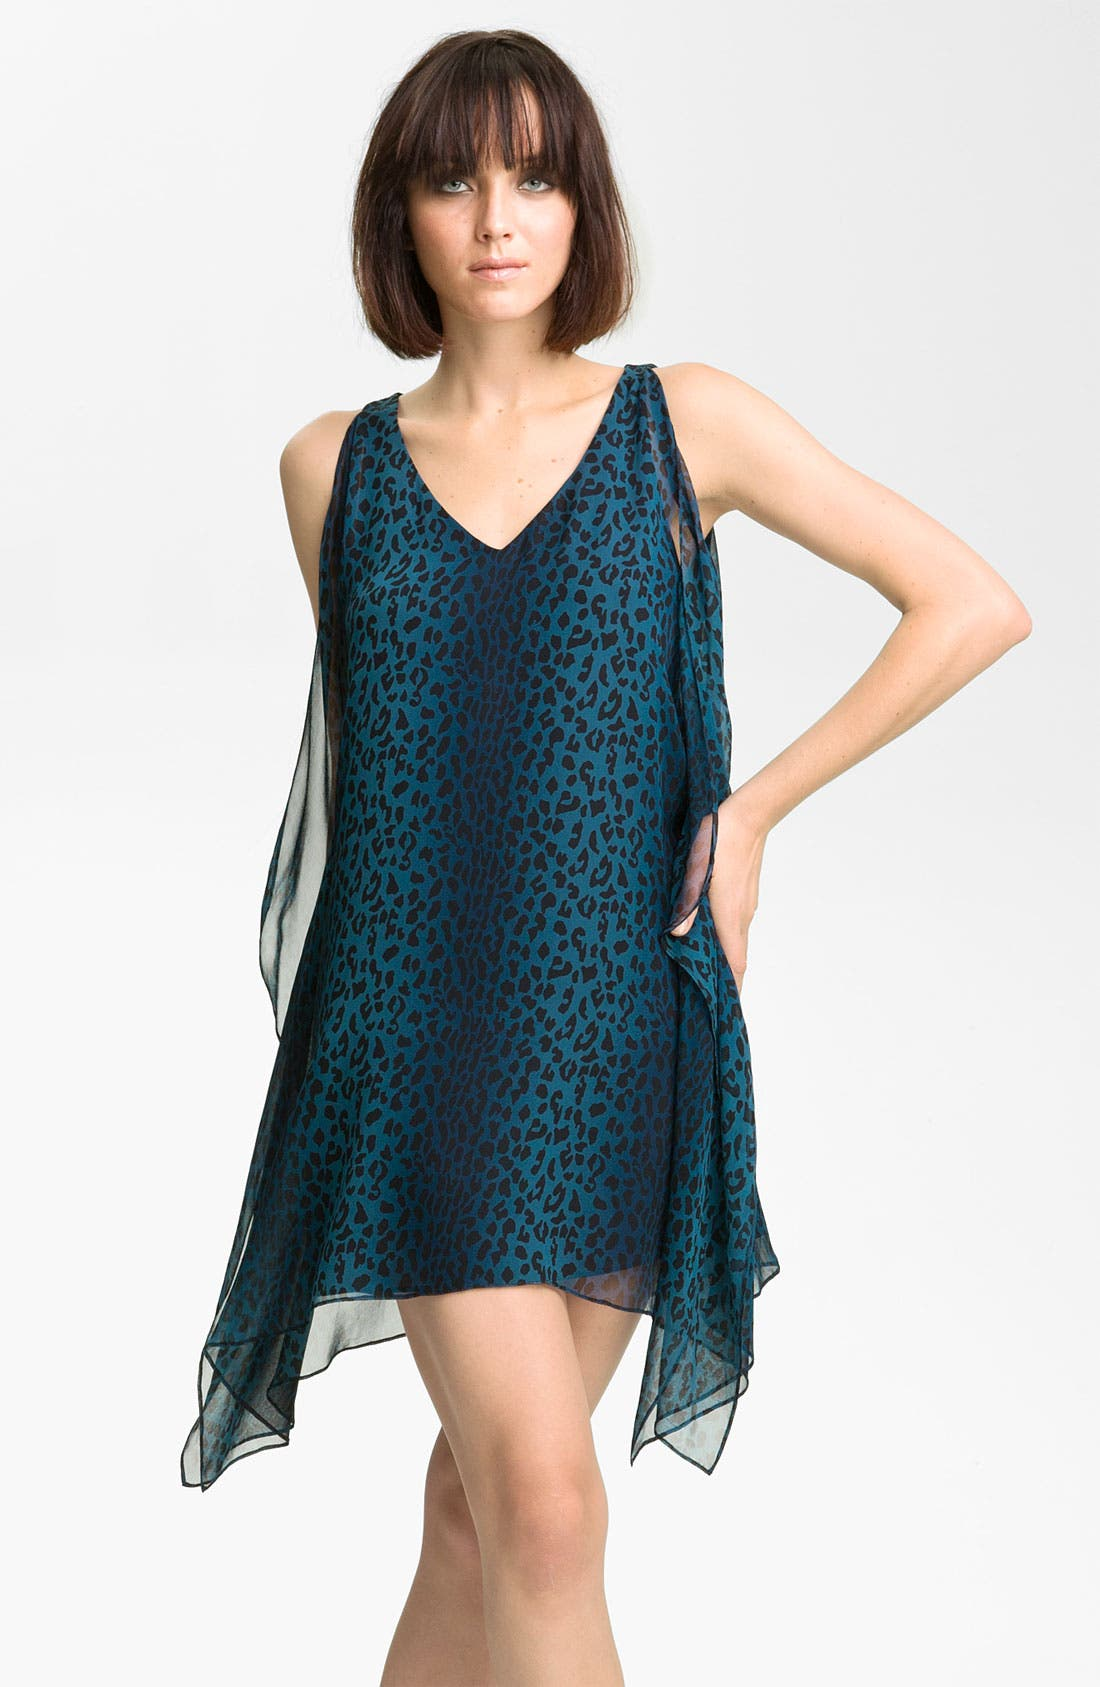 Alternate Image 1 Selected - Jay Godfrey 'Stastny' Leopard Print Chiffon Kimono Dress